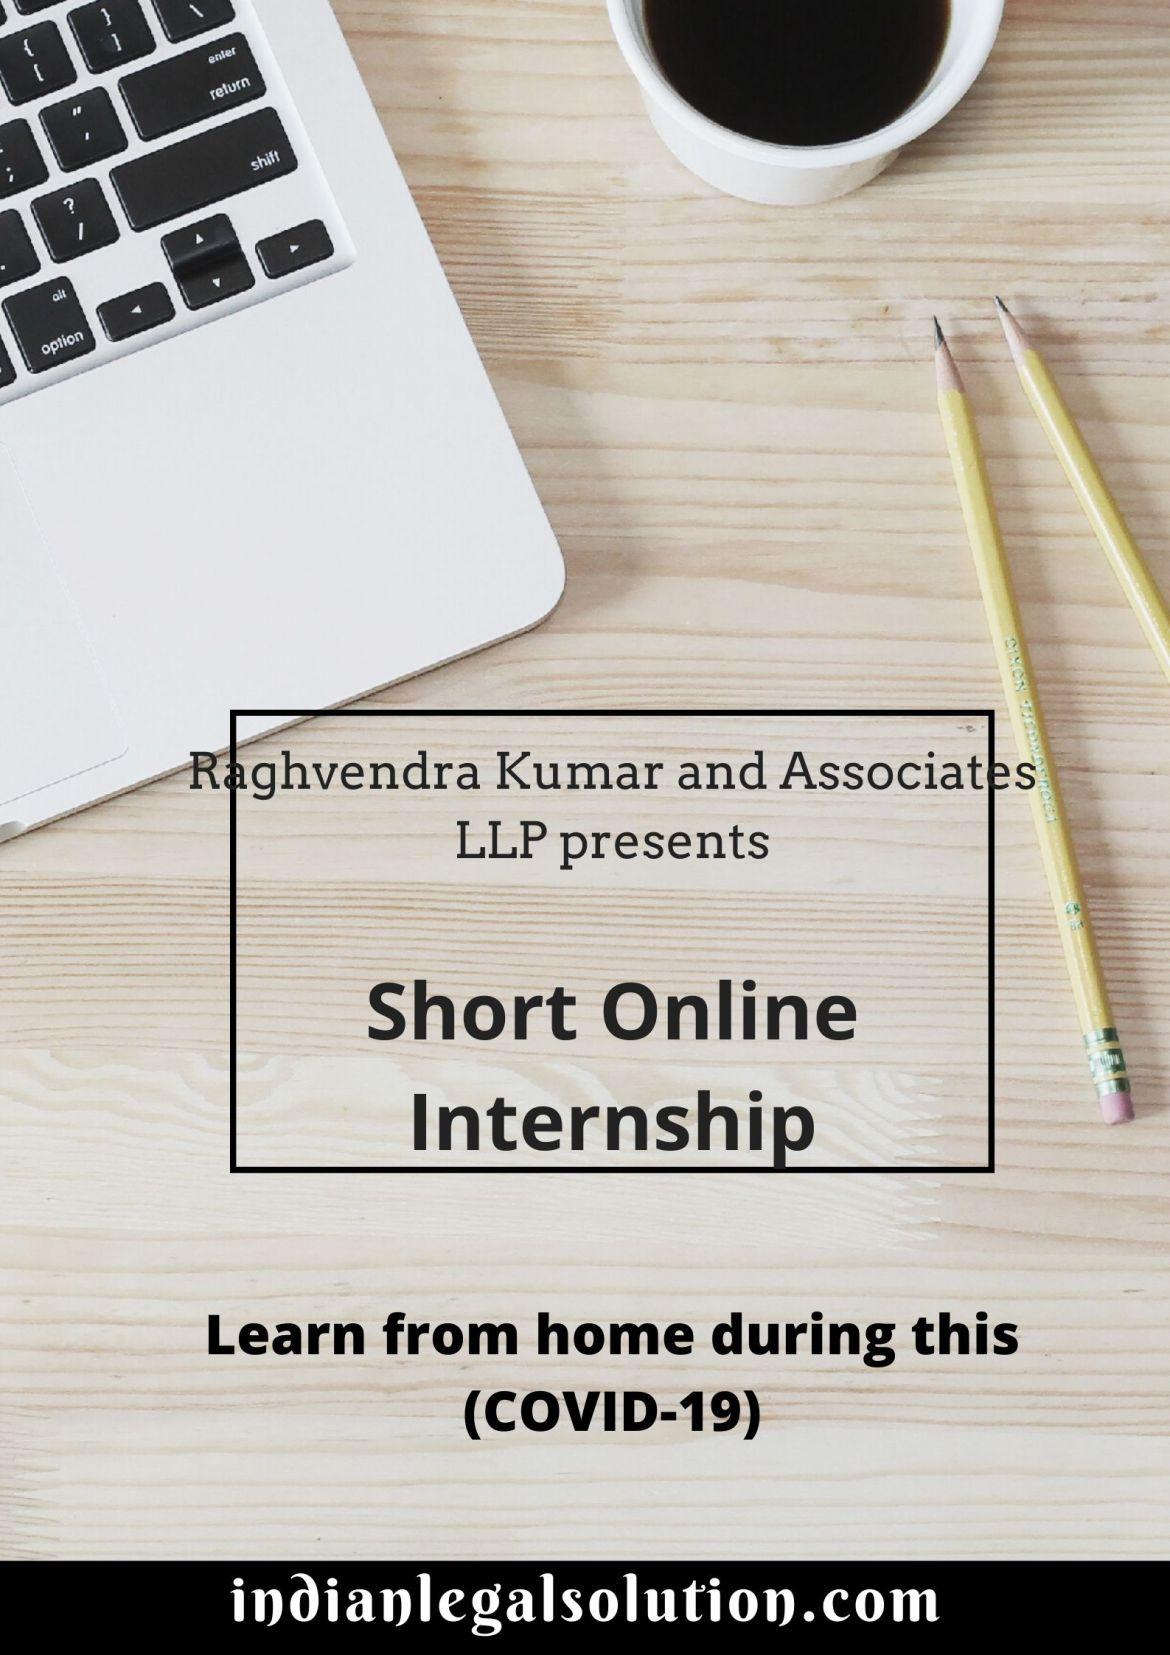 Short online internship opportunity with us.